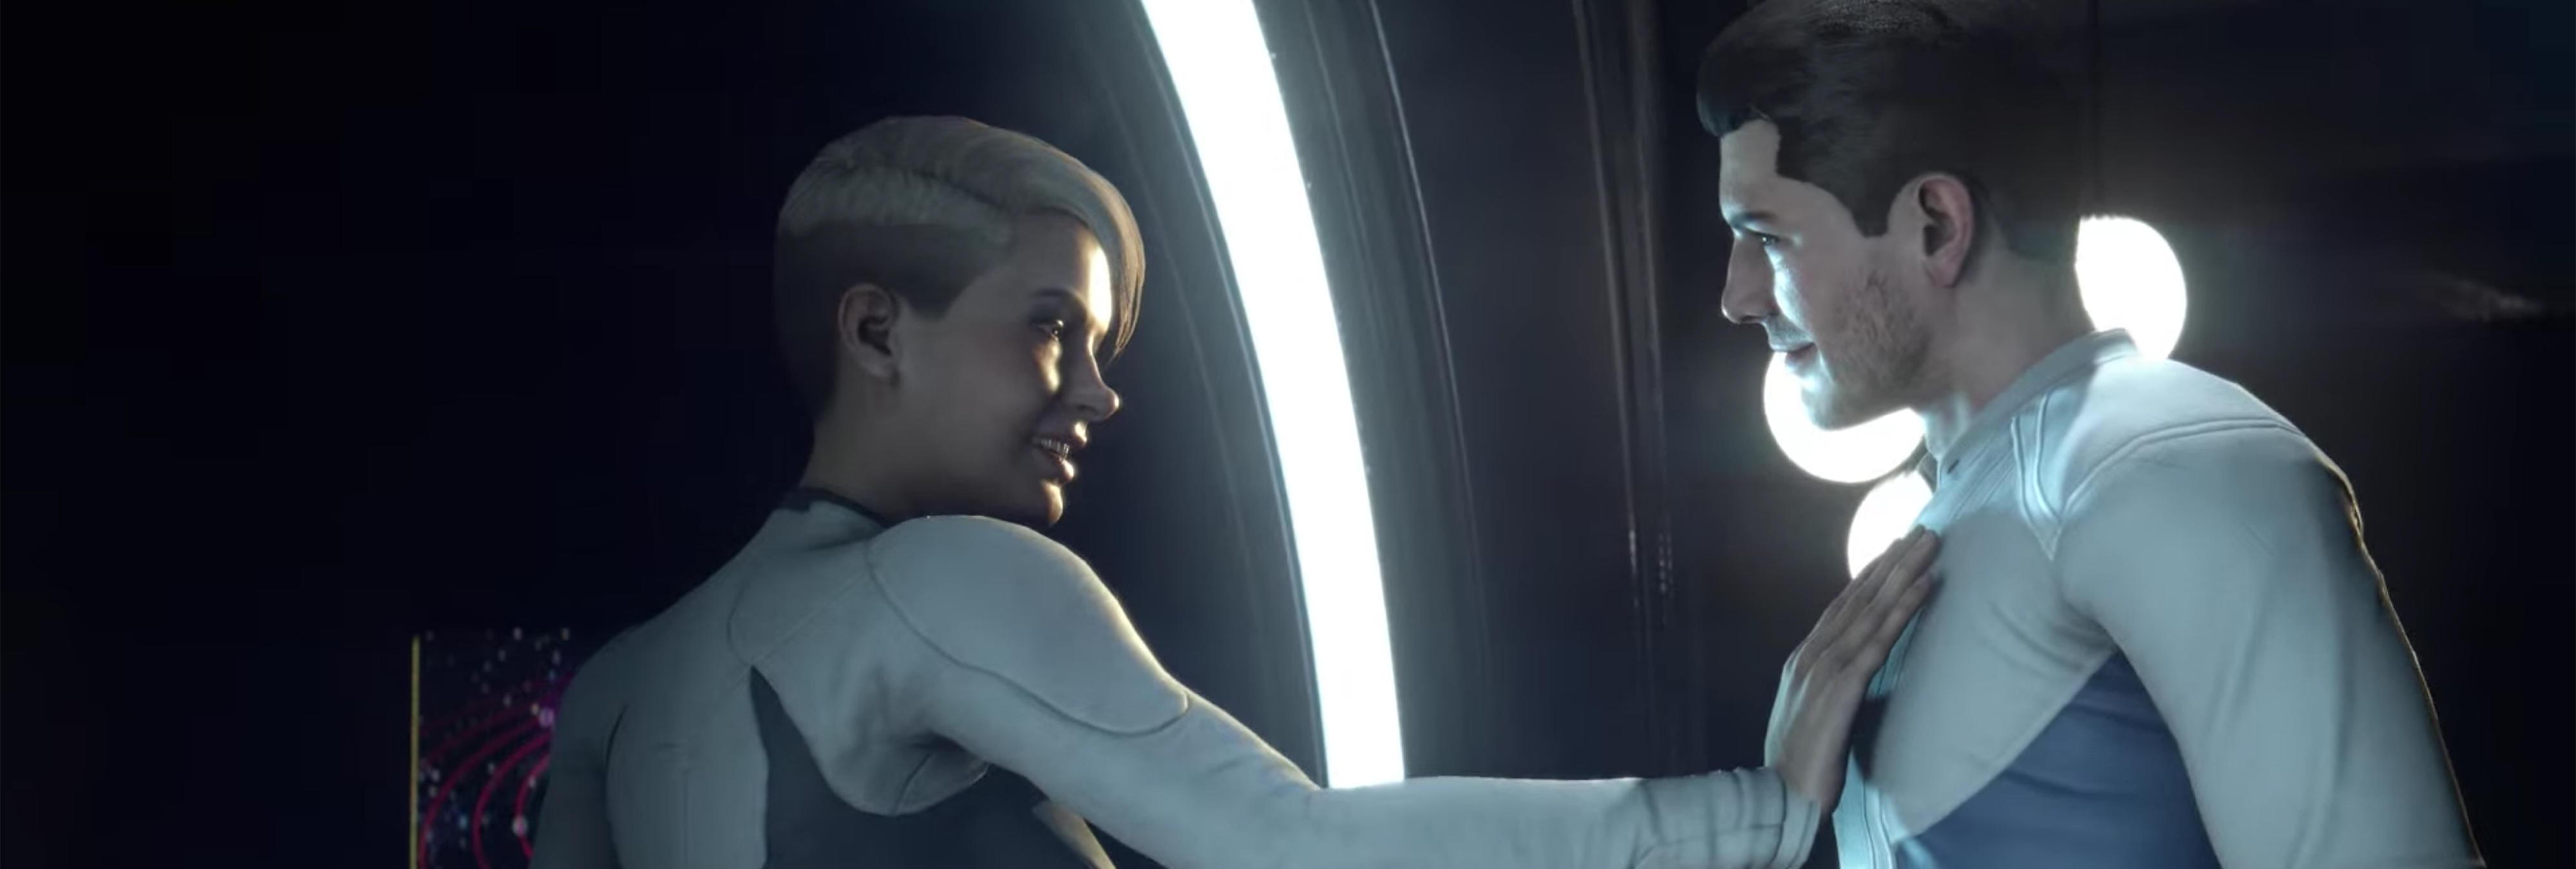 'Mass Effect: Andromeda' da pasos atrás en el sexo dentro de los videojuegos